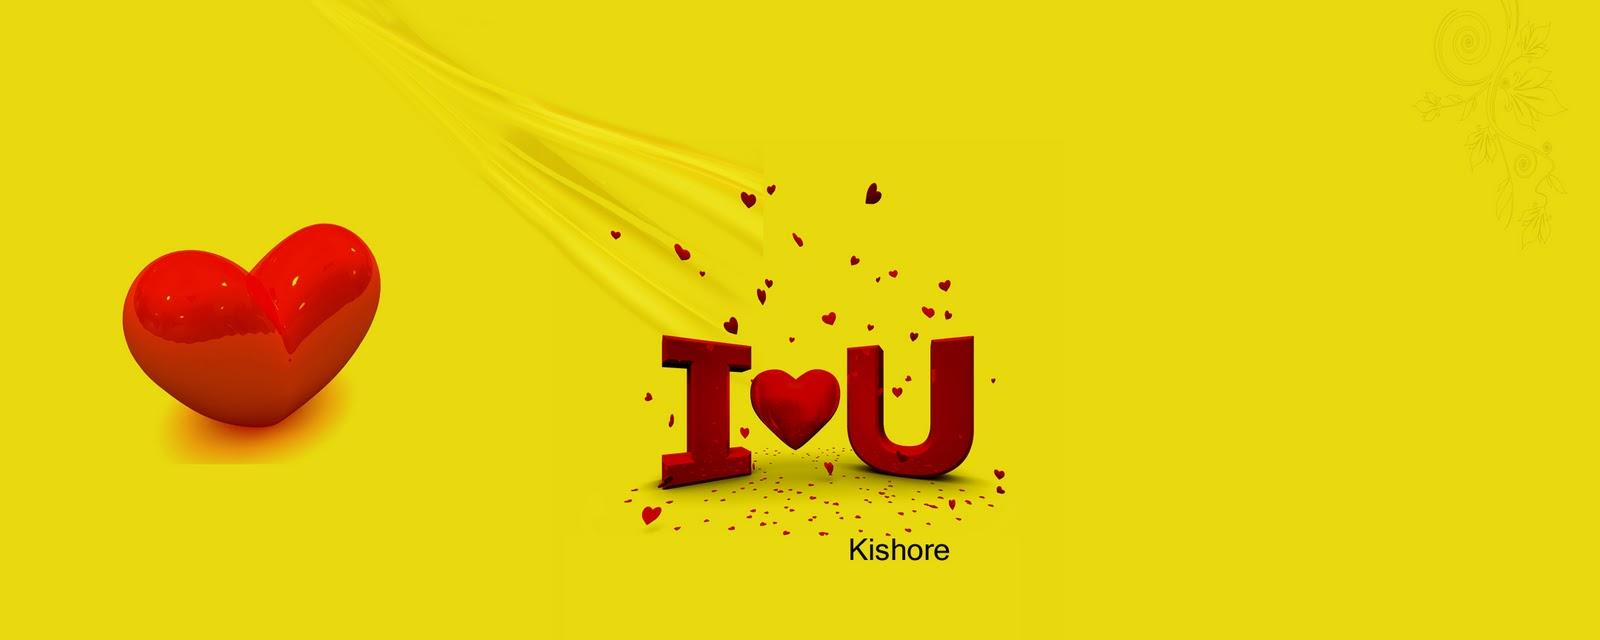 karizma album designs jpg free Download